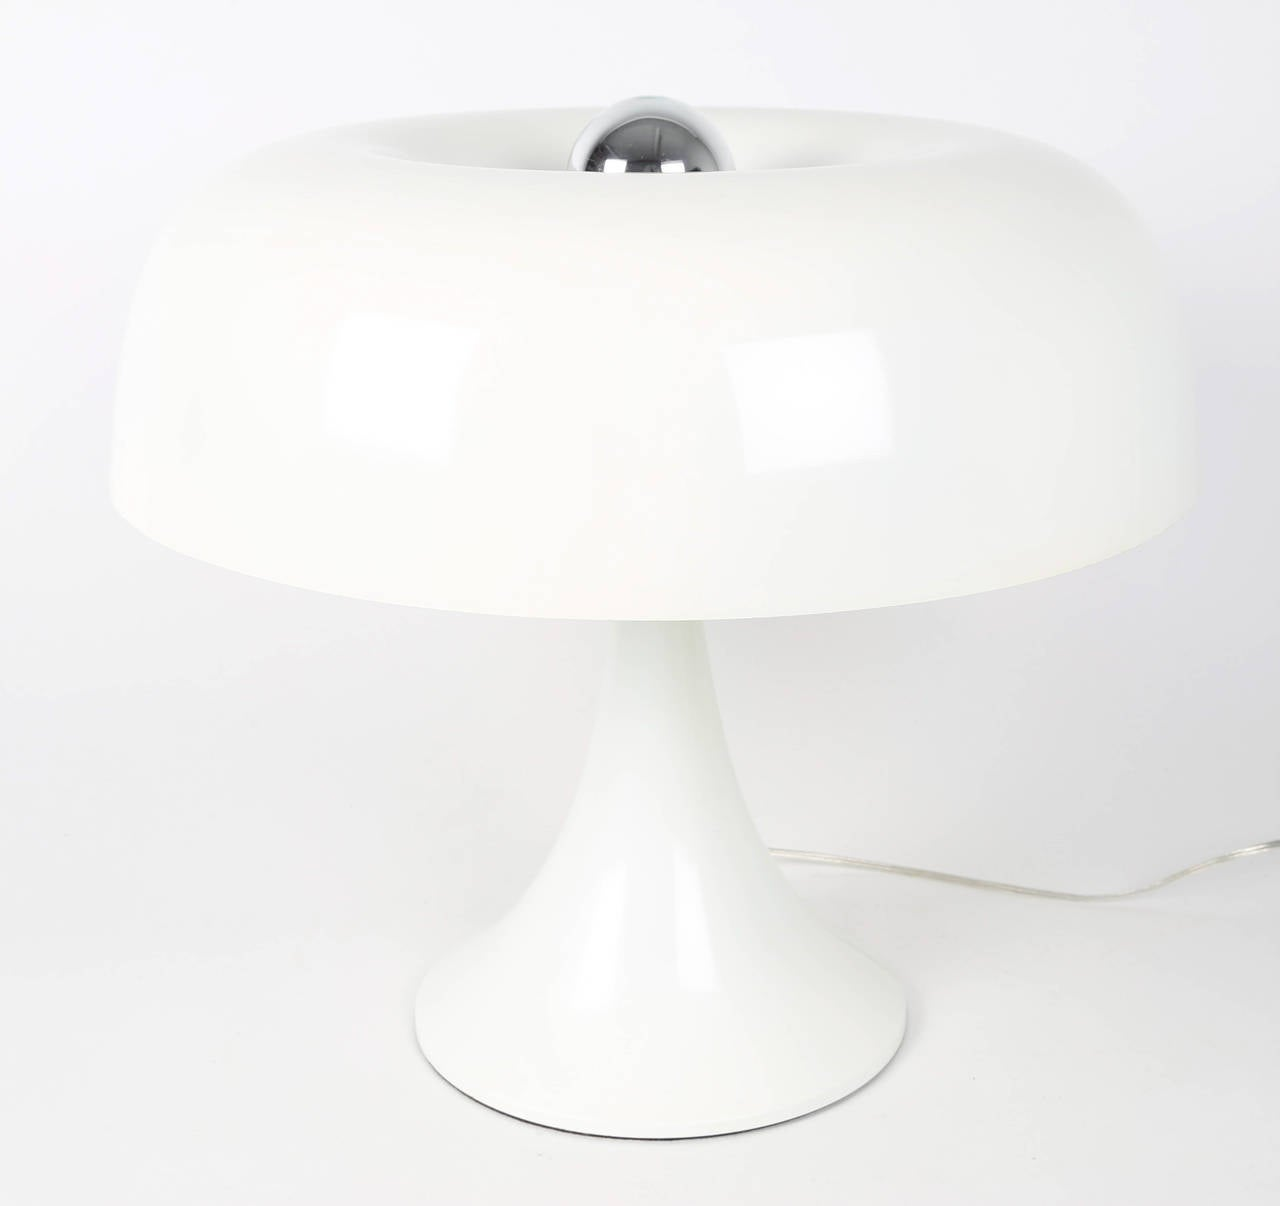 Enameled Groovy Robert Sonneman Mushroom Table Lamp, circa 1970s For Sale